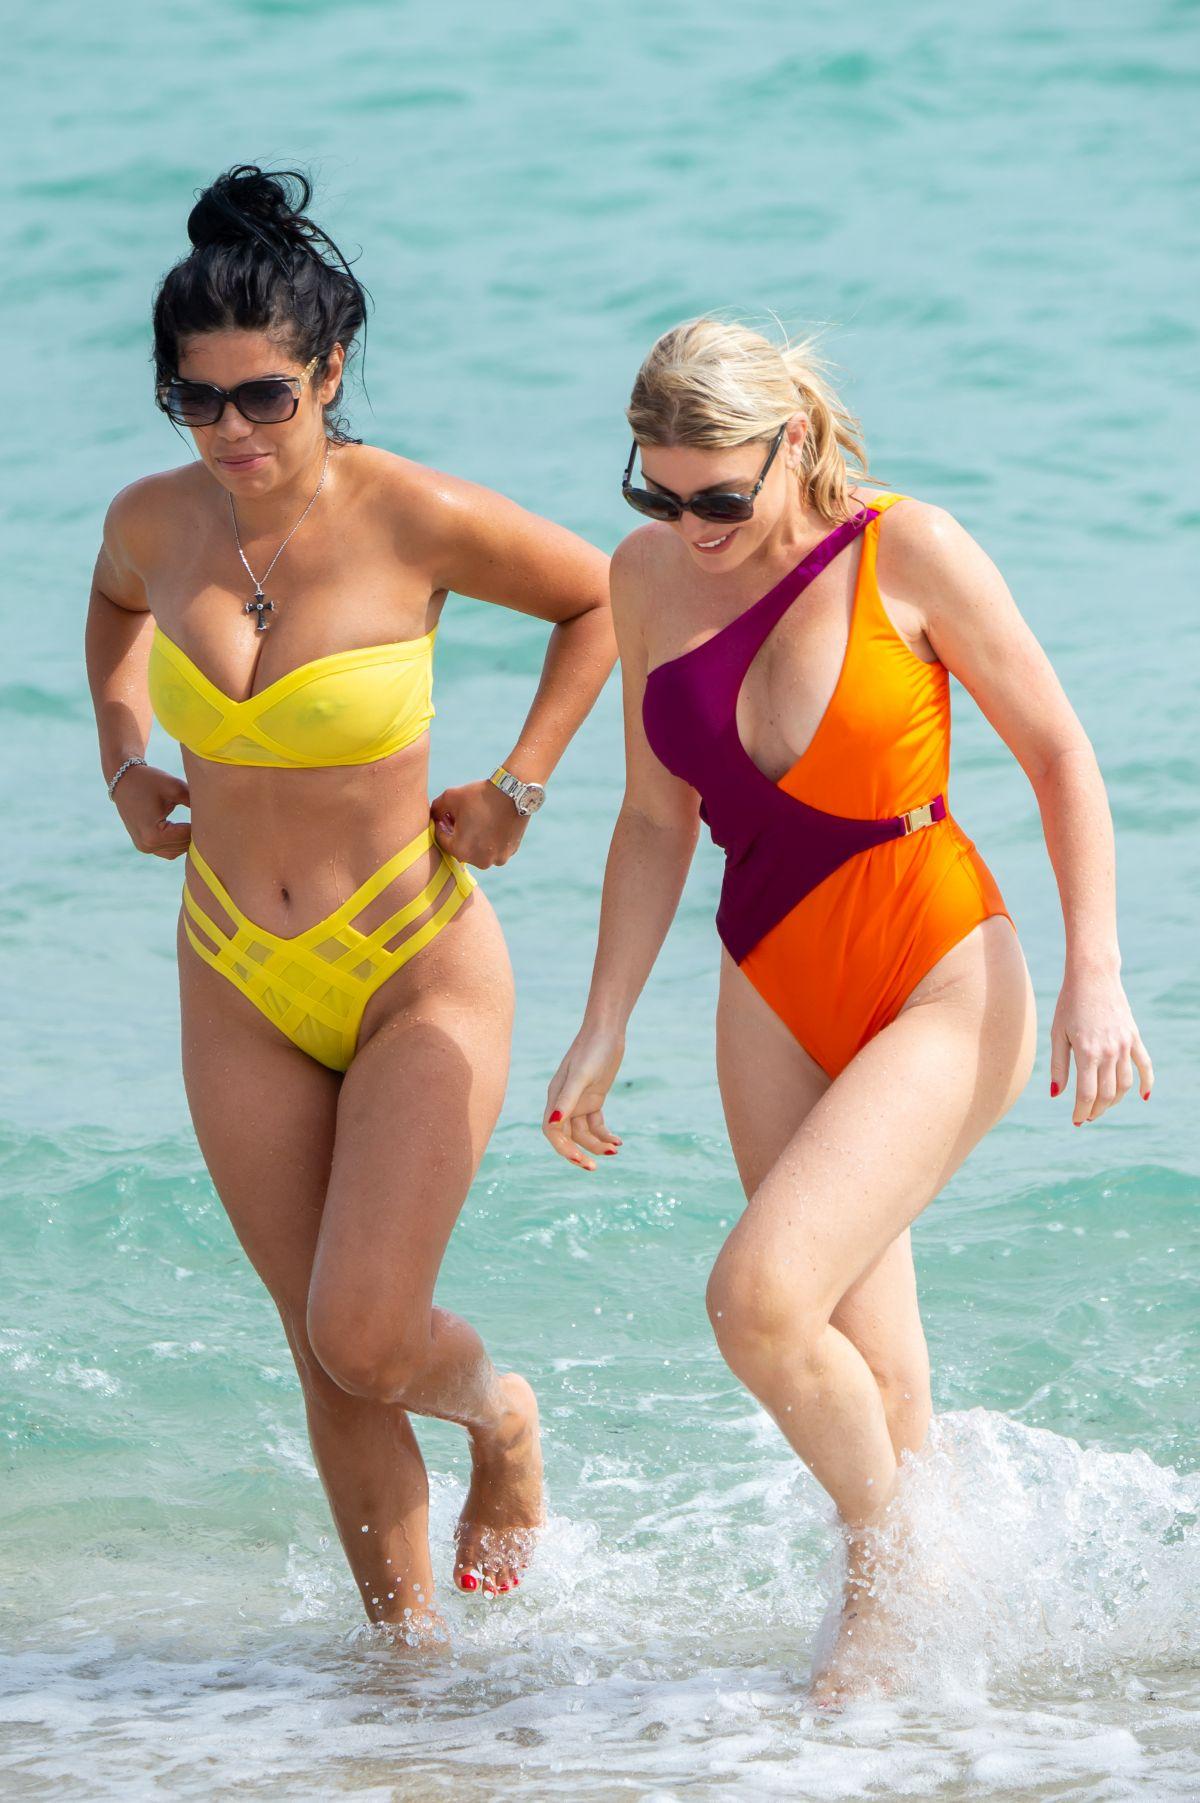 Bikini Claudia Romani nudes (21 foto and video), Tits, Paparazzi, Selfie, in bikini 2015